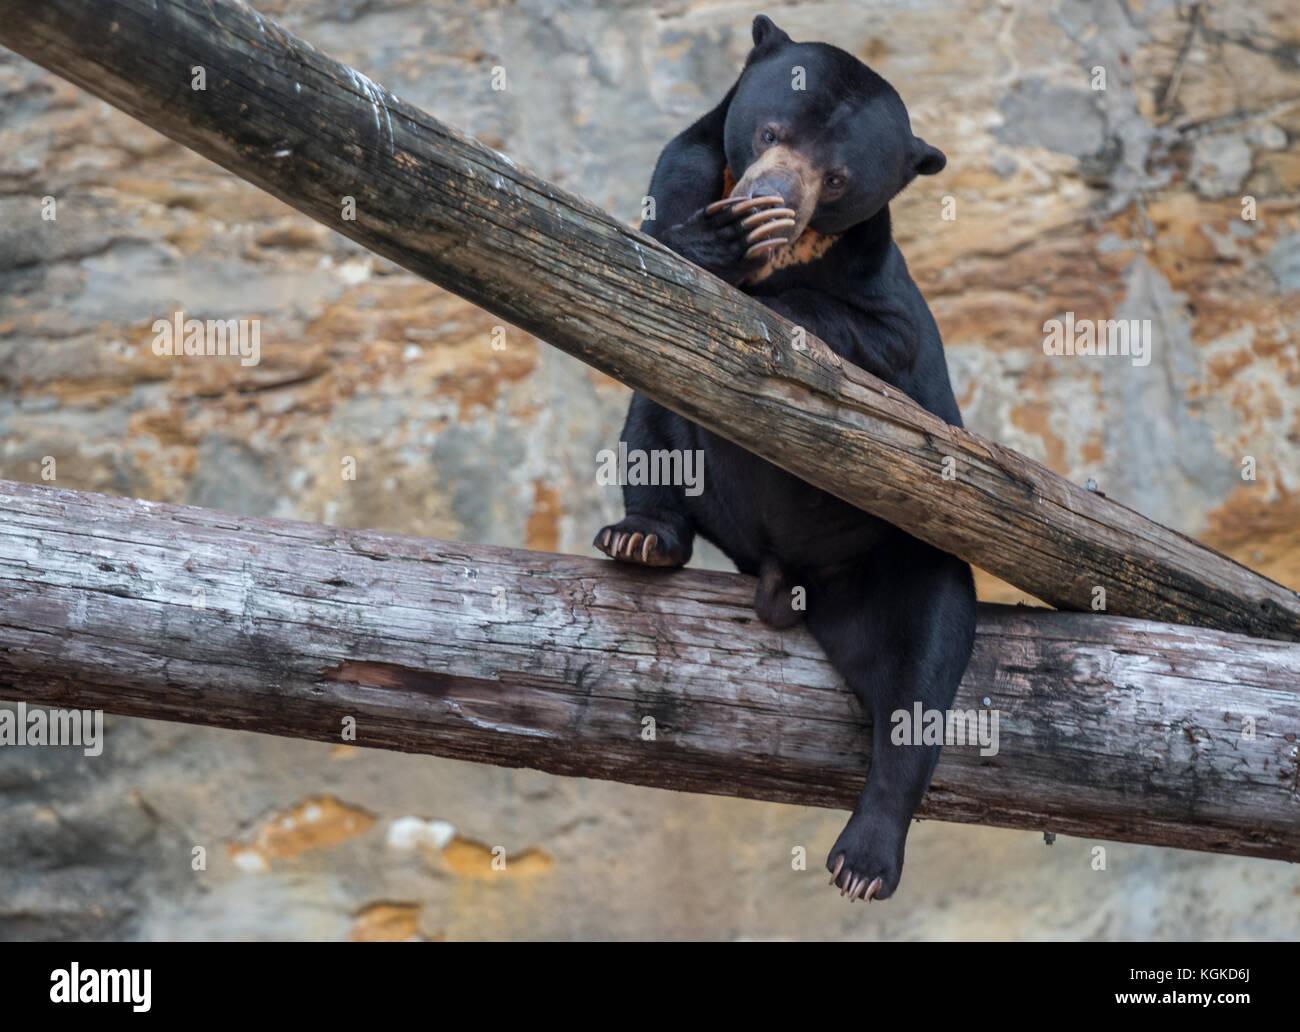 Black Bear Cub Sitting on Tree Trunk - Stock Image